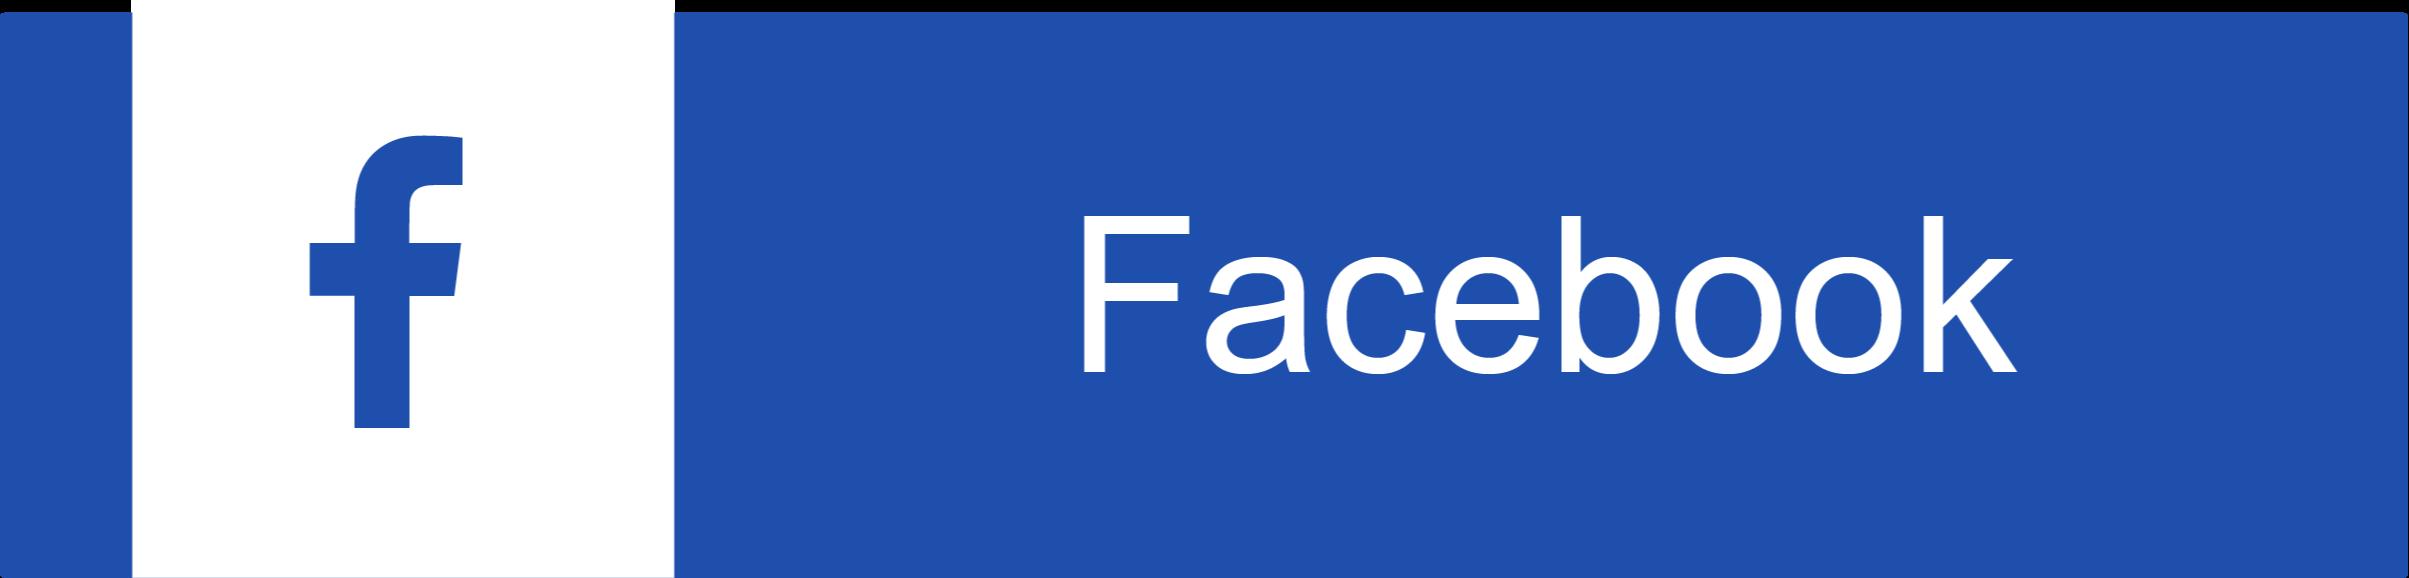 Facebook - Digital Design